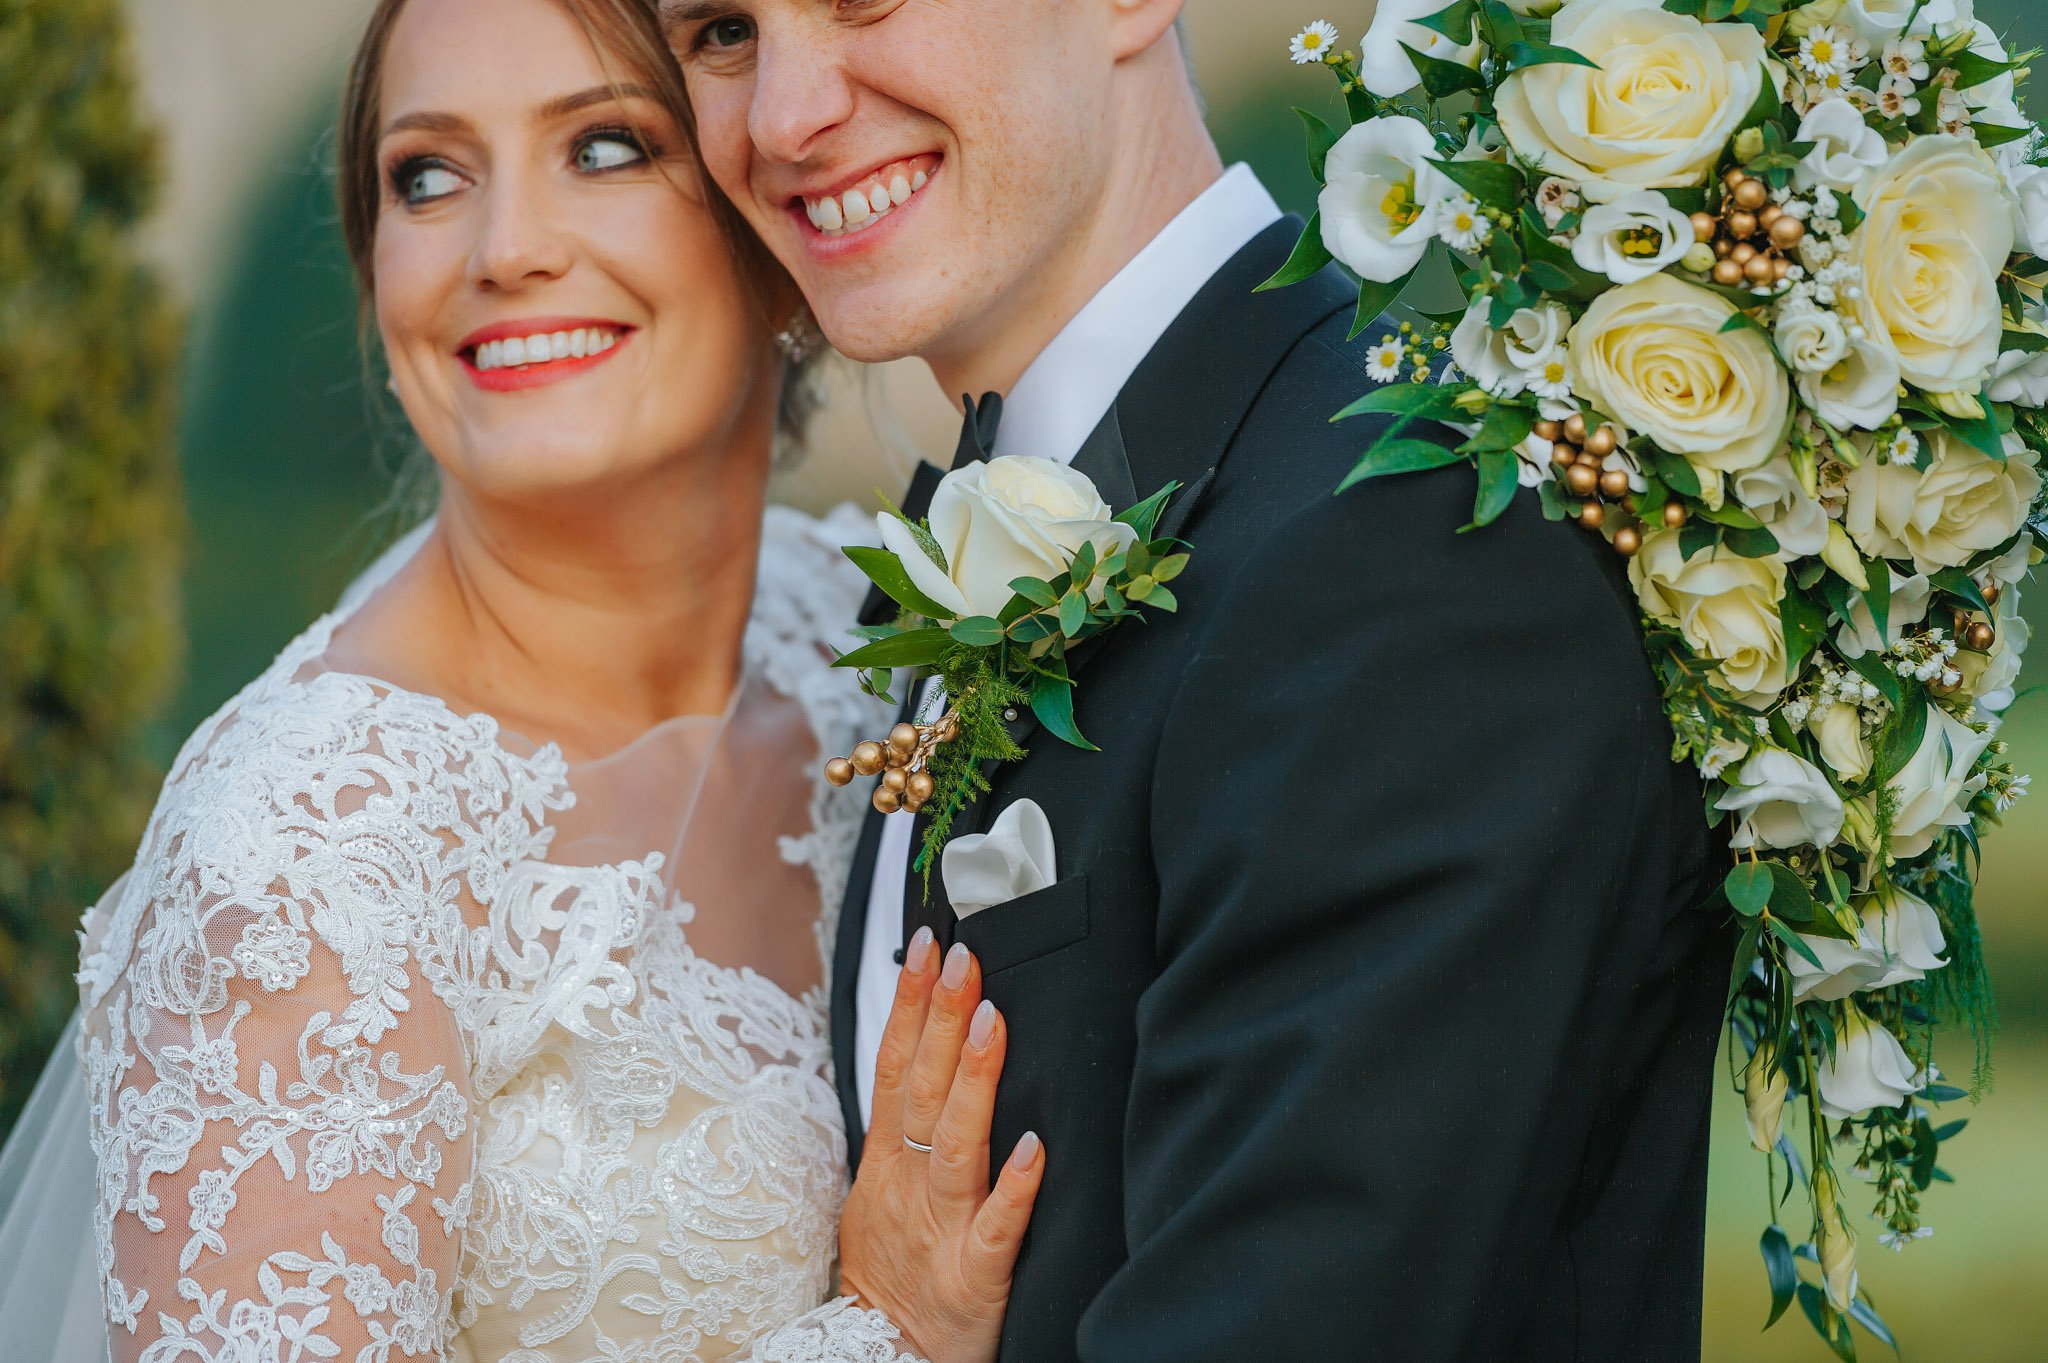 Coombe Abbey wedding in Coventry, Warwickshire - Sam + Matt 50